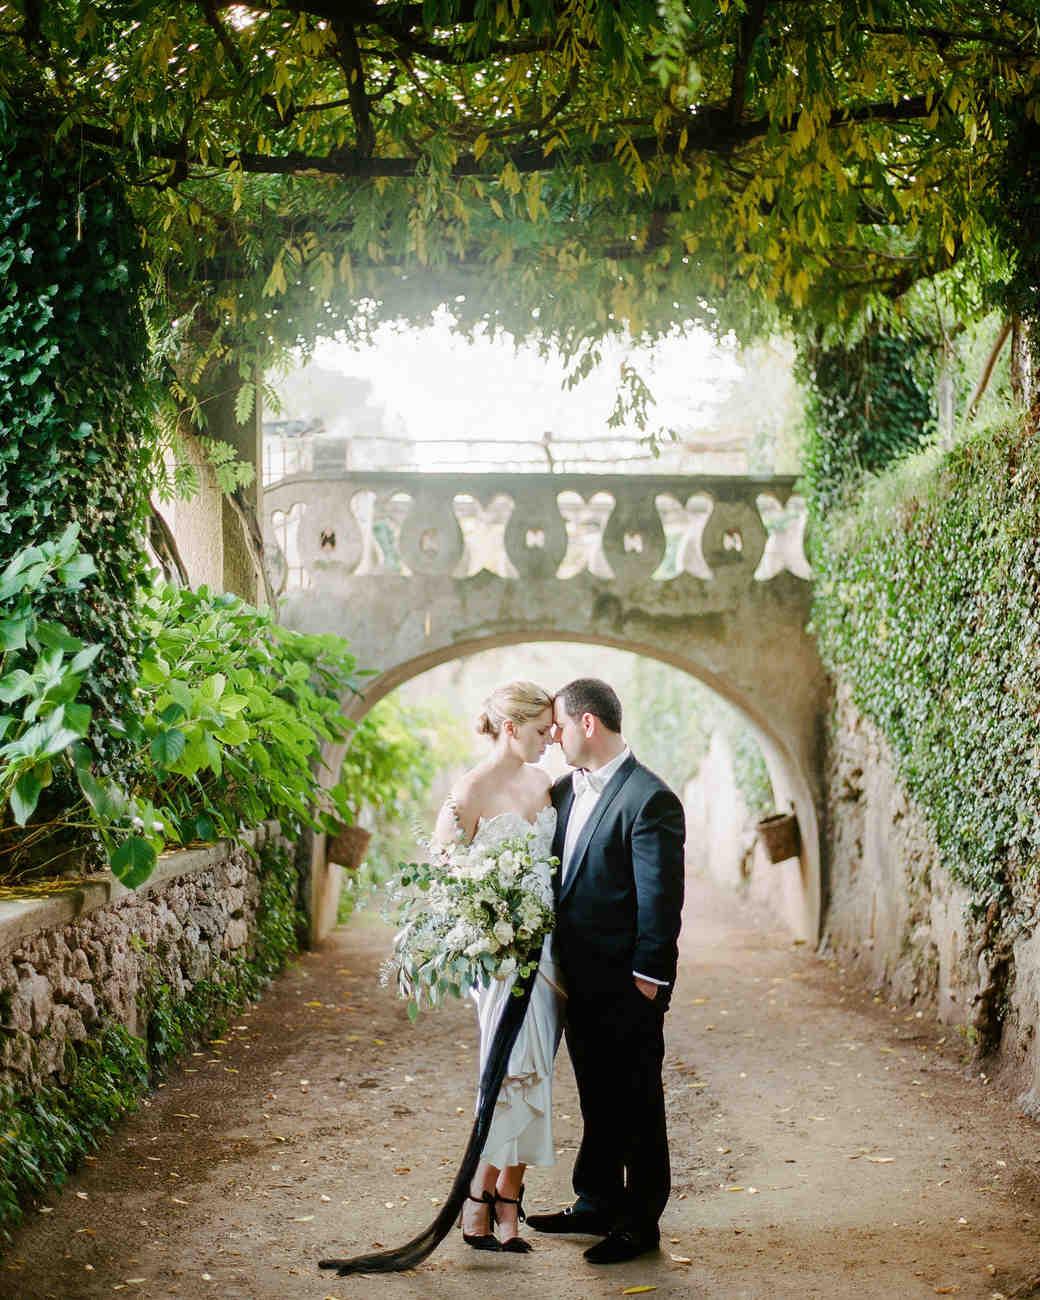 A Chic  Intimate Destination Wedding on the Amalfi Coast